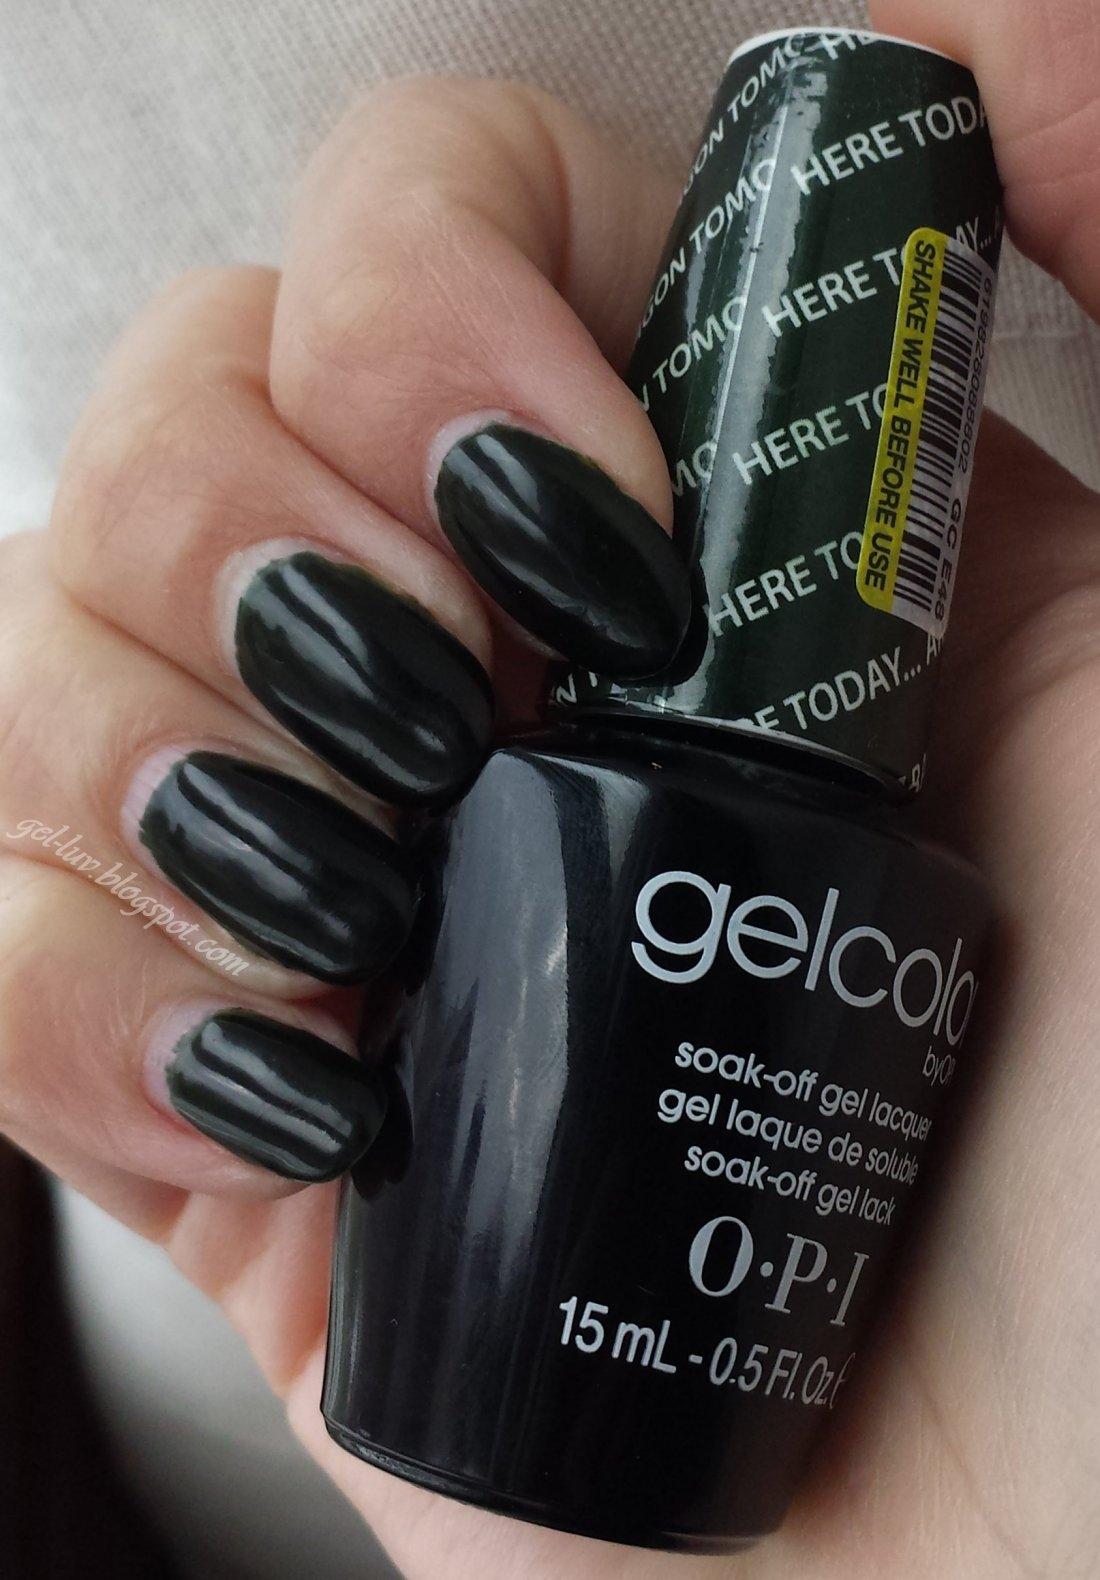 Opi Gel Nail Polish Color Chart 2016 To Bend Light